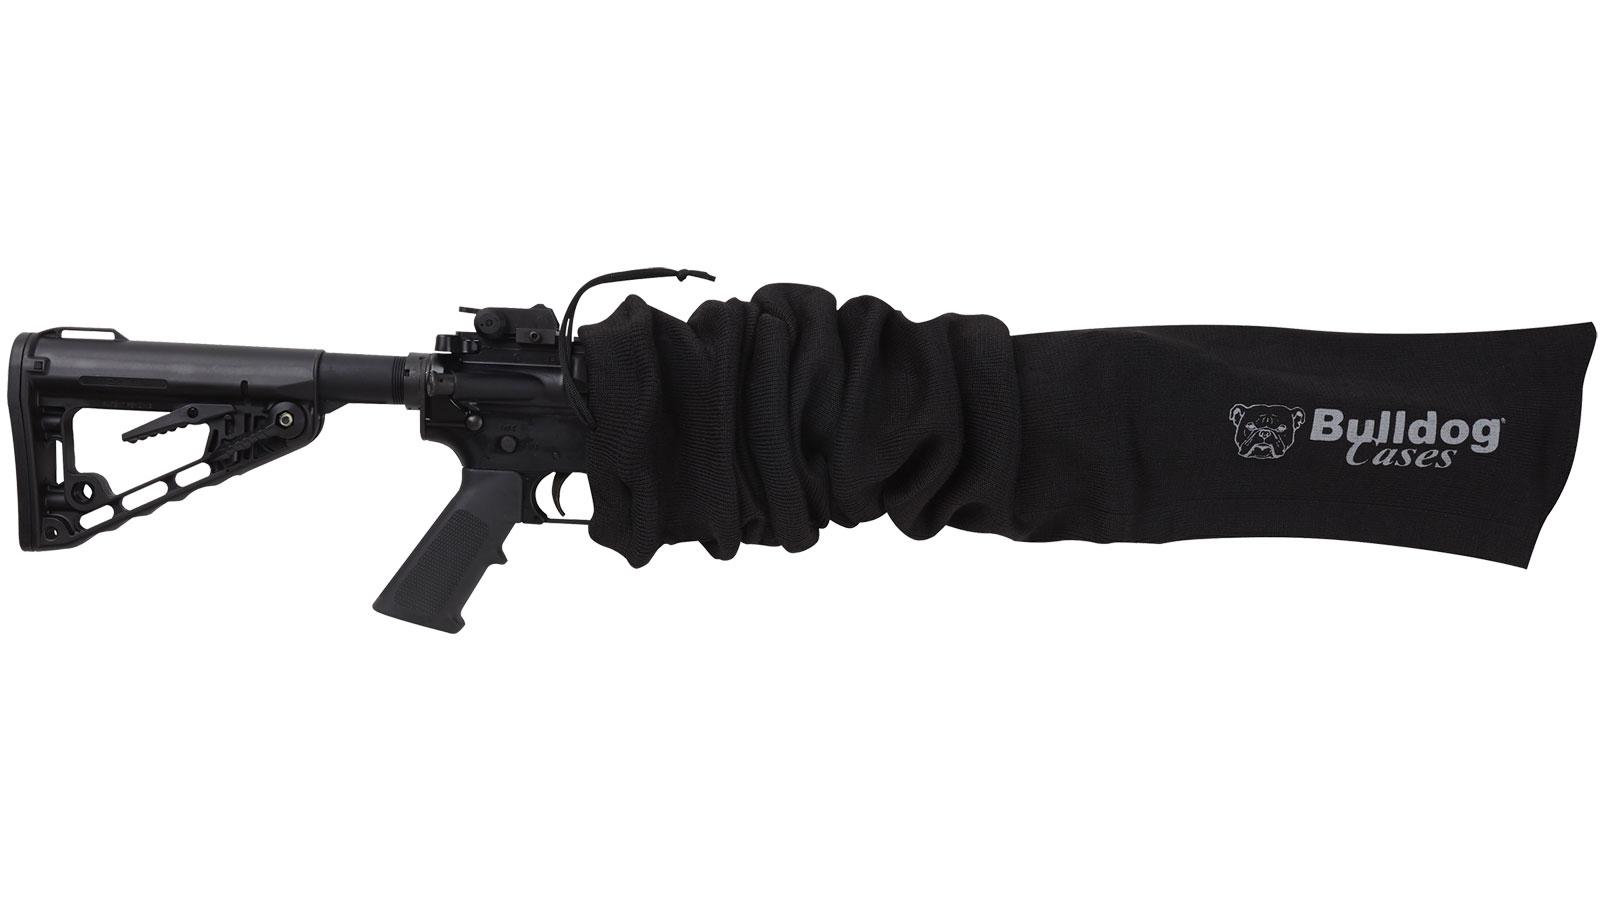 Bulldog BD158 Tactical Gun Sock 45 x 6 in.  Black in.